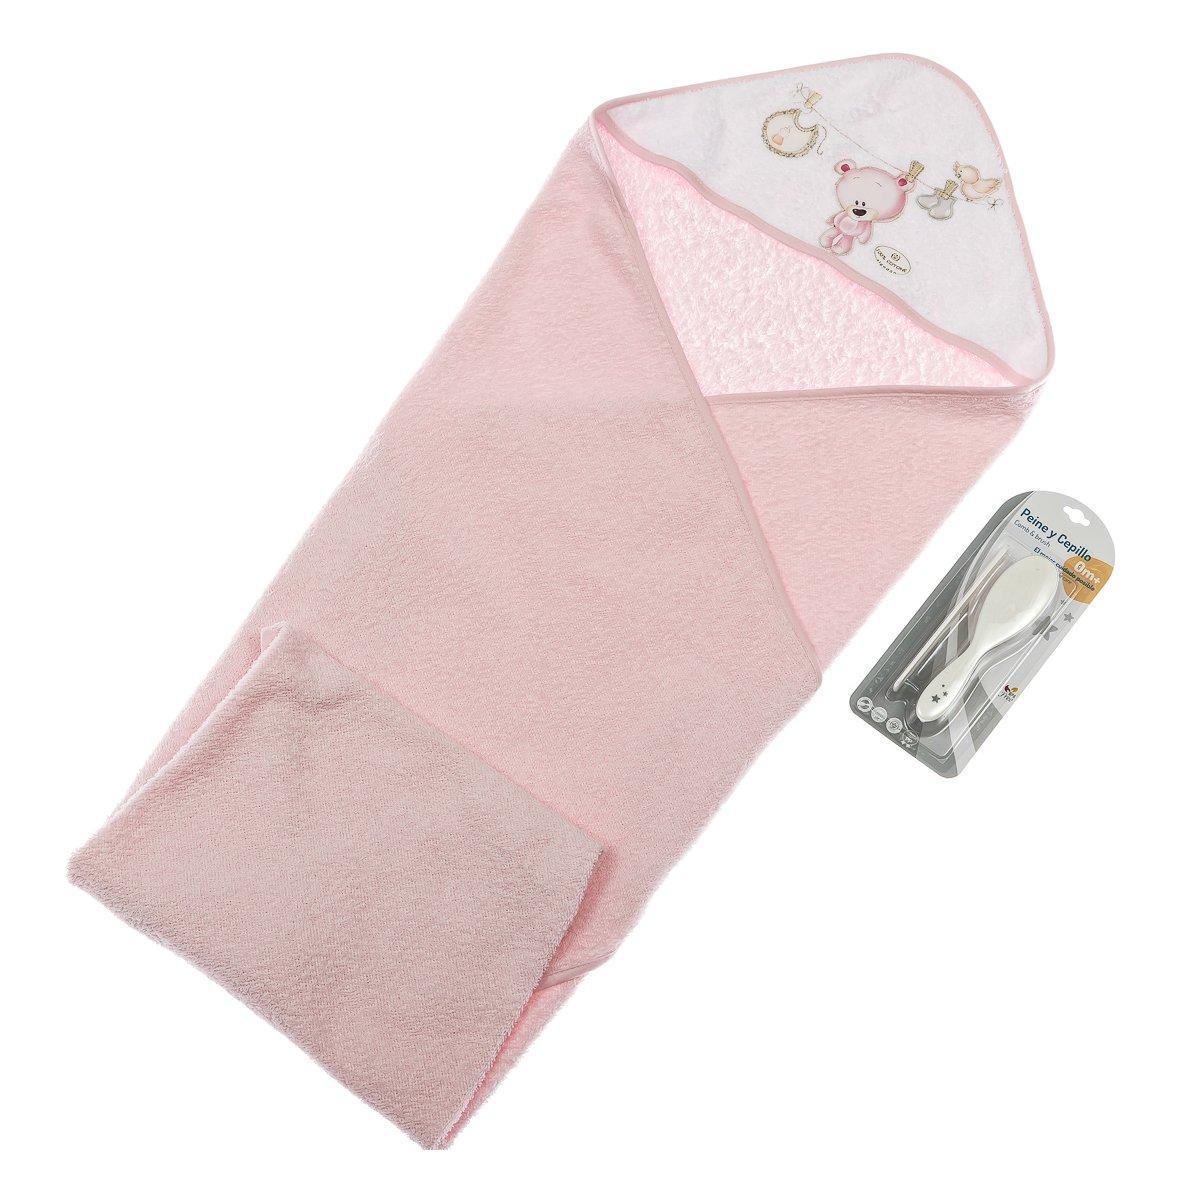 Полотенце и набор расчесок Interbaby Teddy Pink 100х100 см